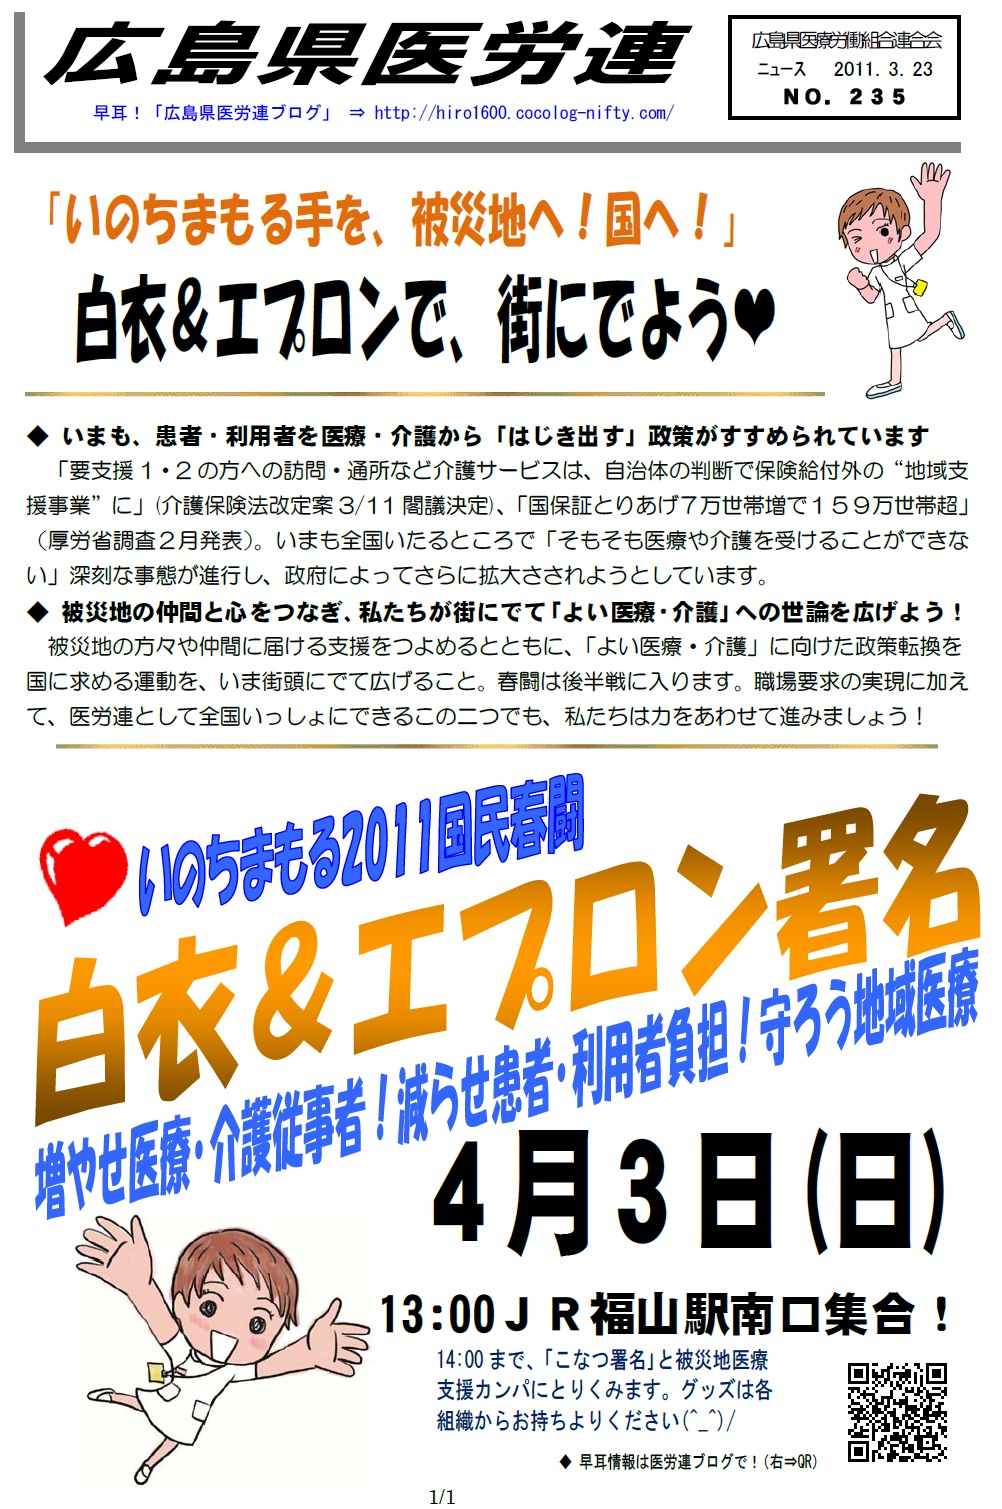 News235110323